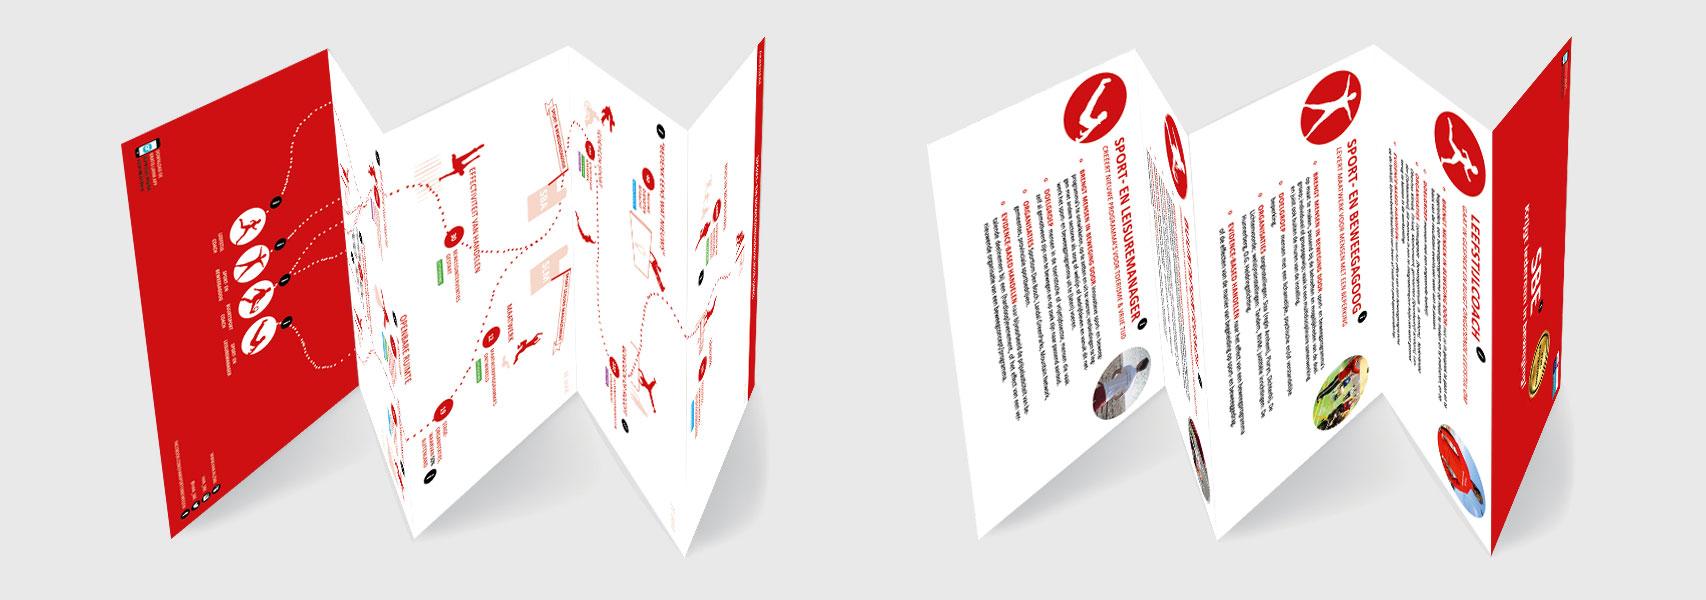 SBE infographic 2015 folder